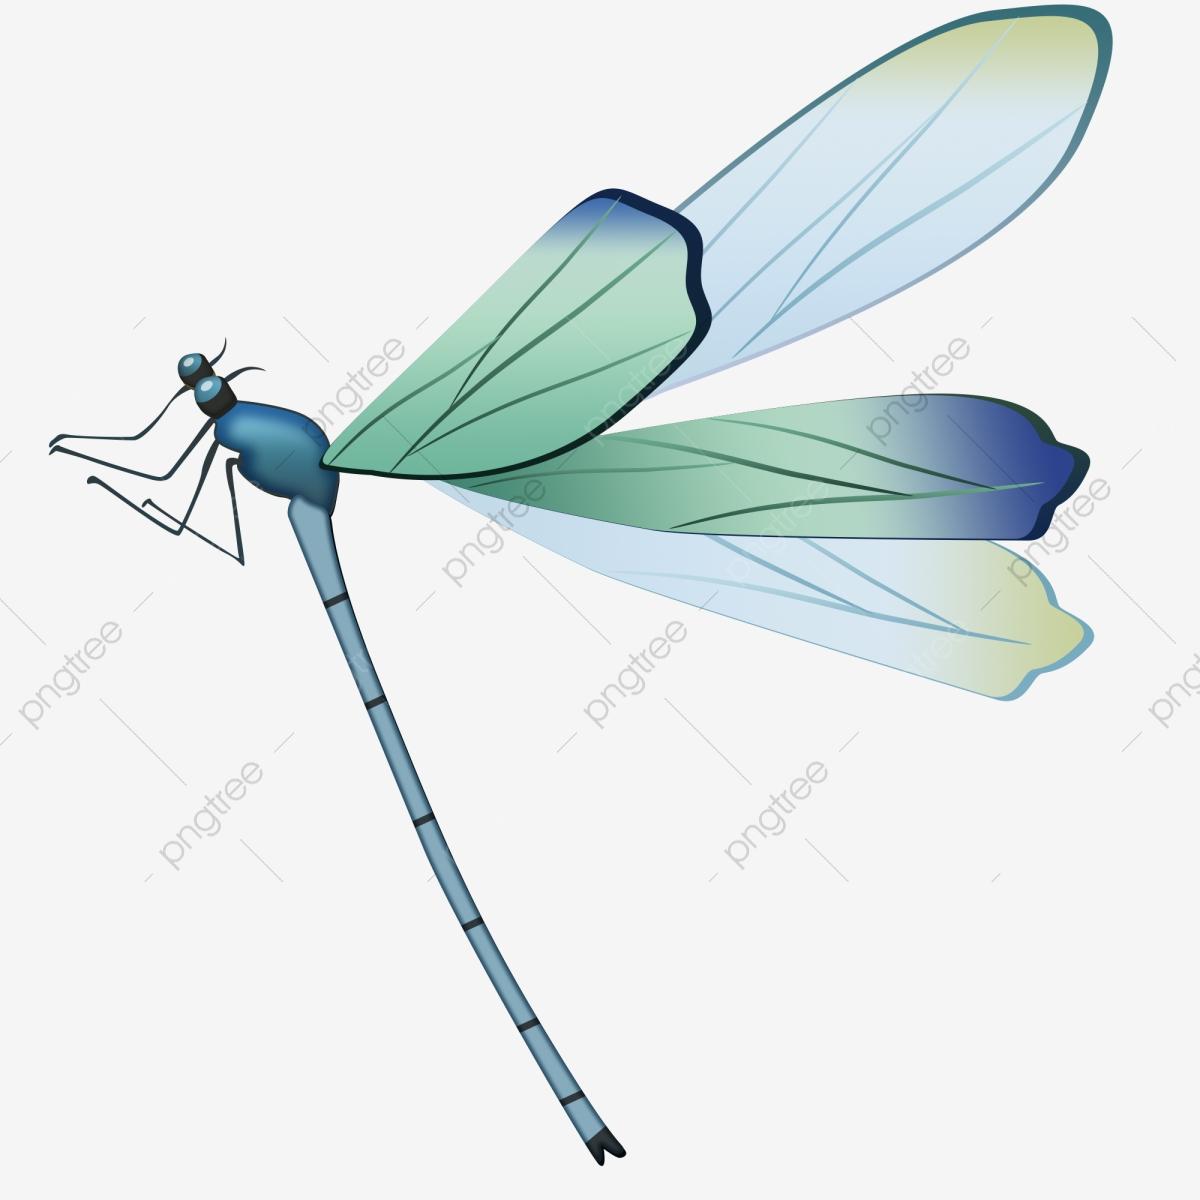 Cartoon vacation great heat. Dragonfly clipart summer